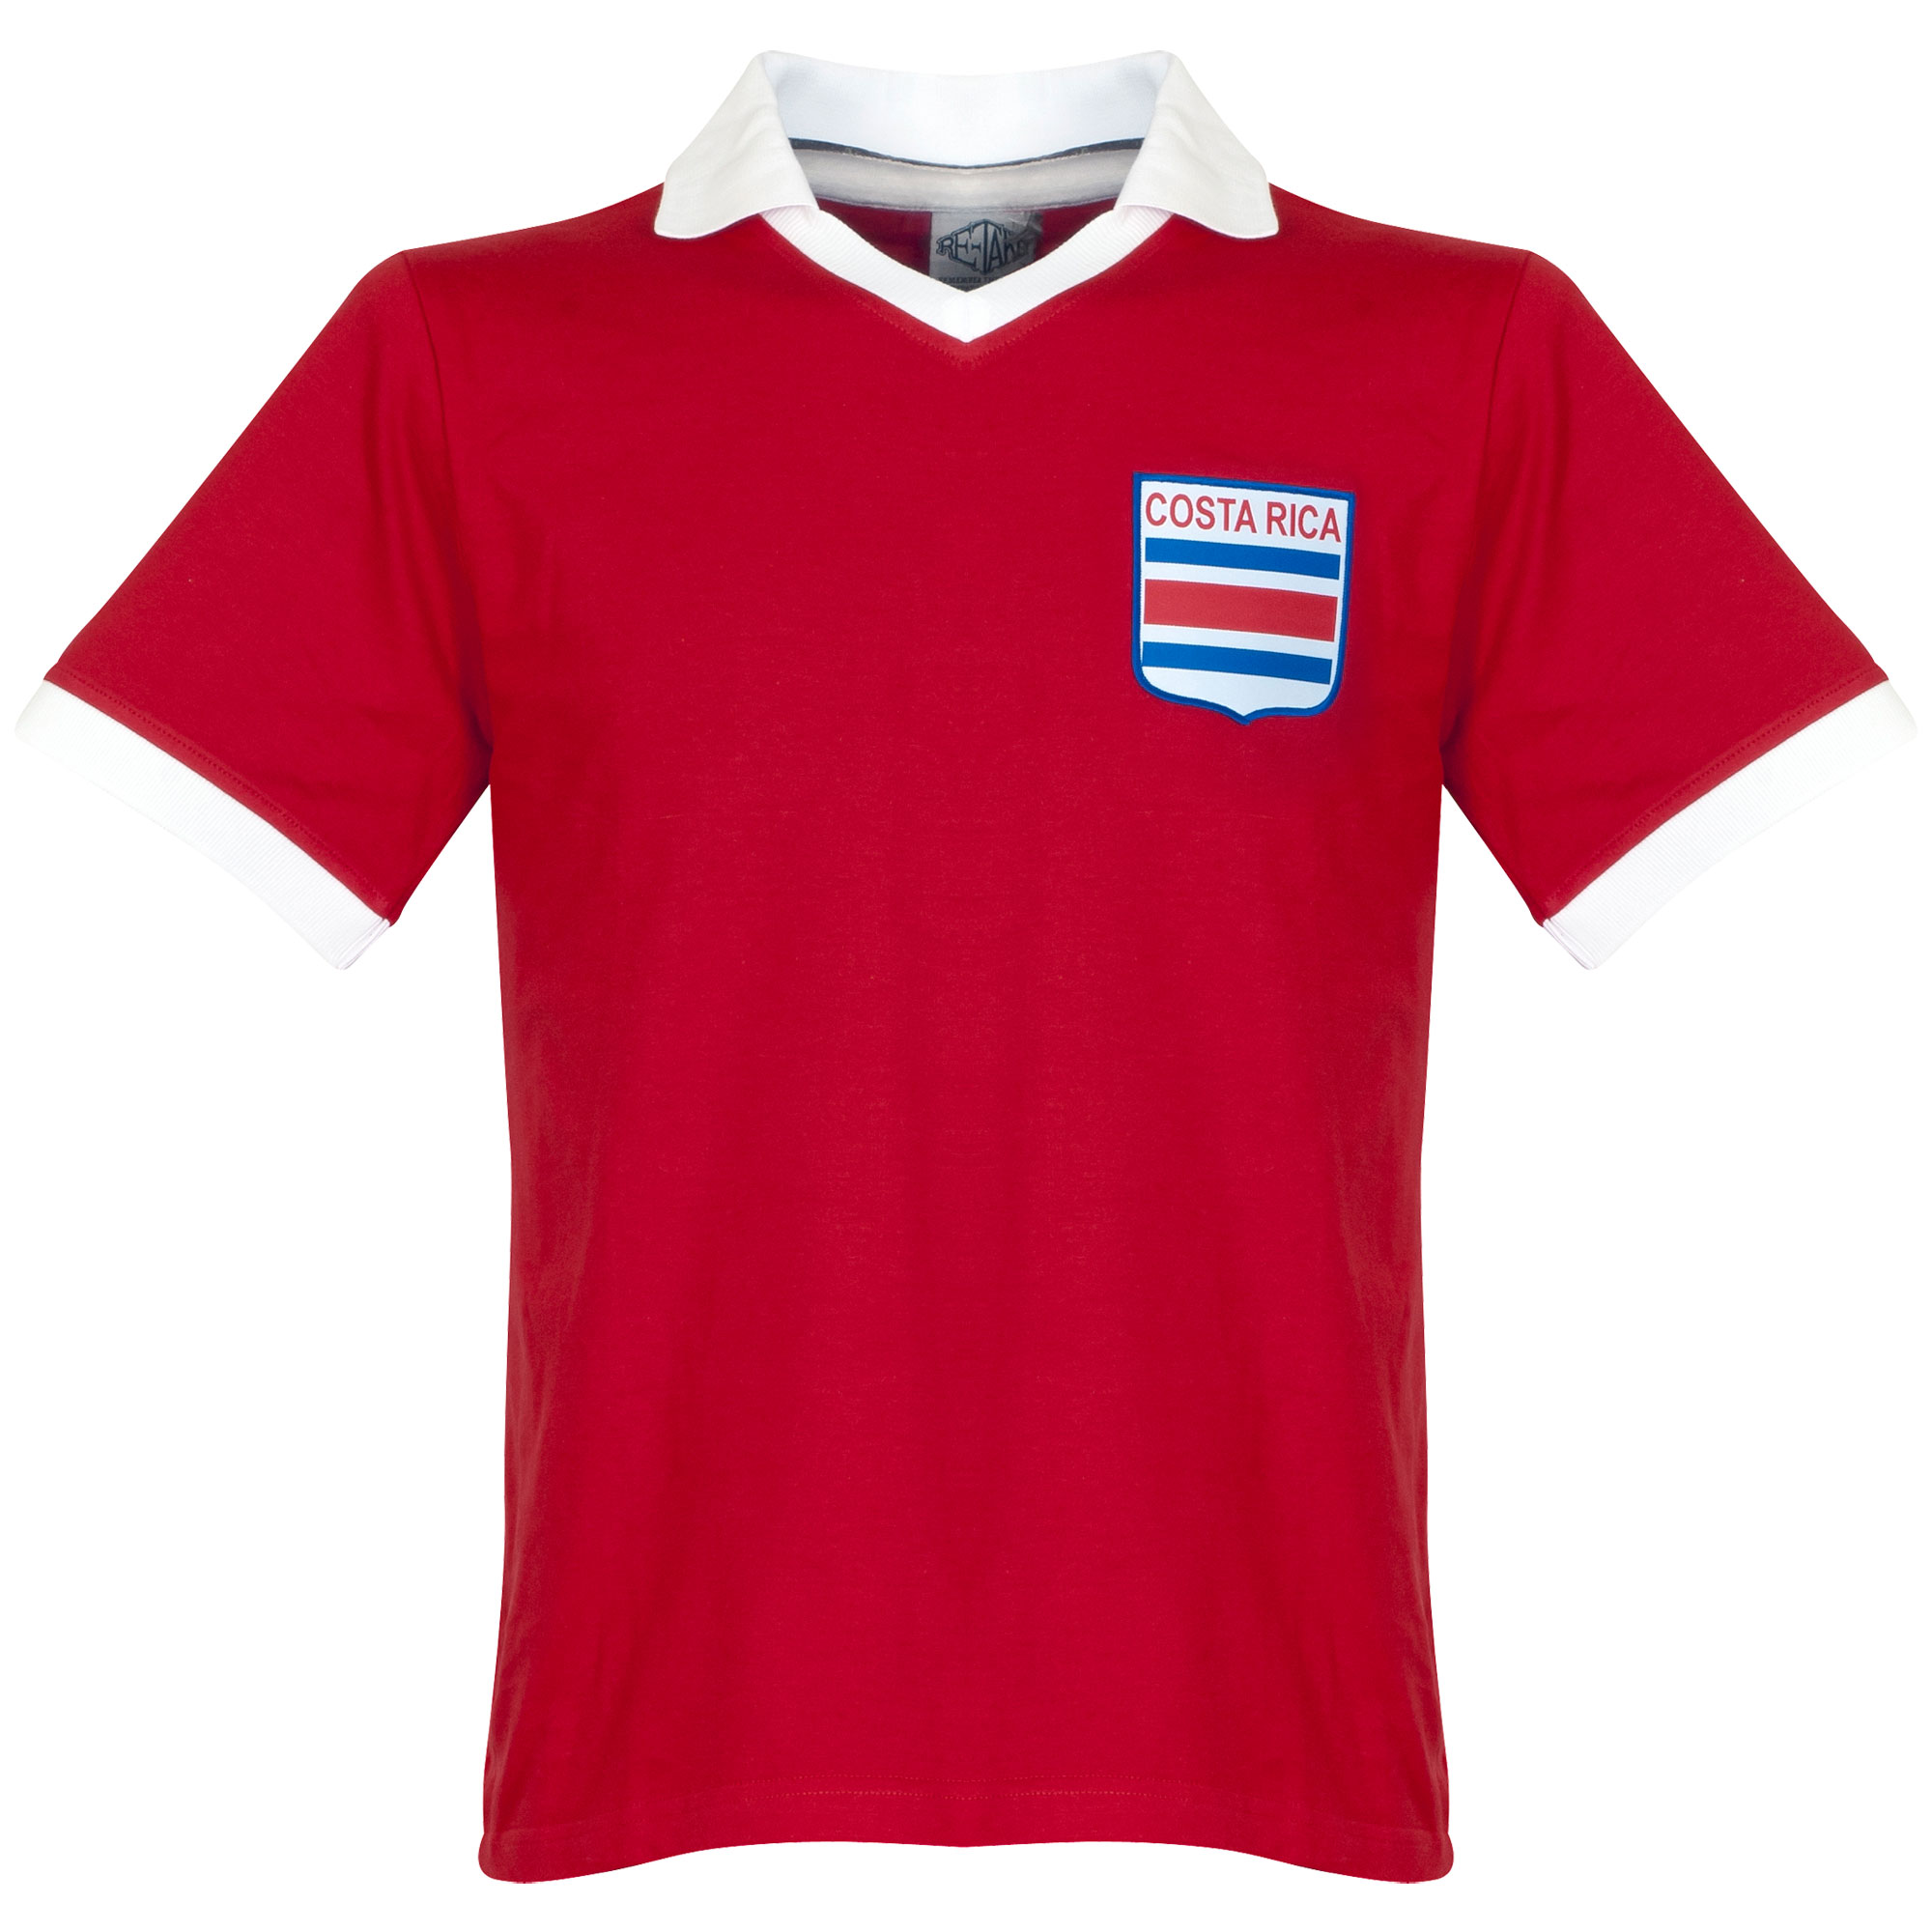 Retake Costa Rica Home Retro Shirt